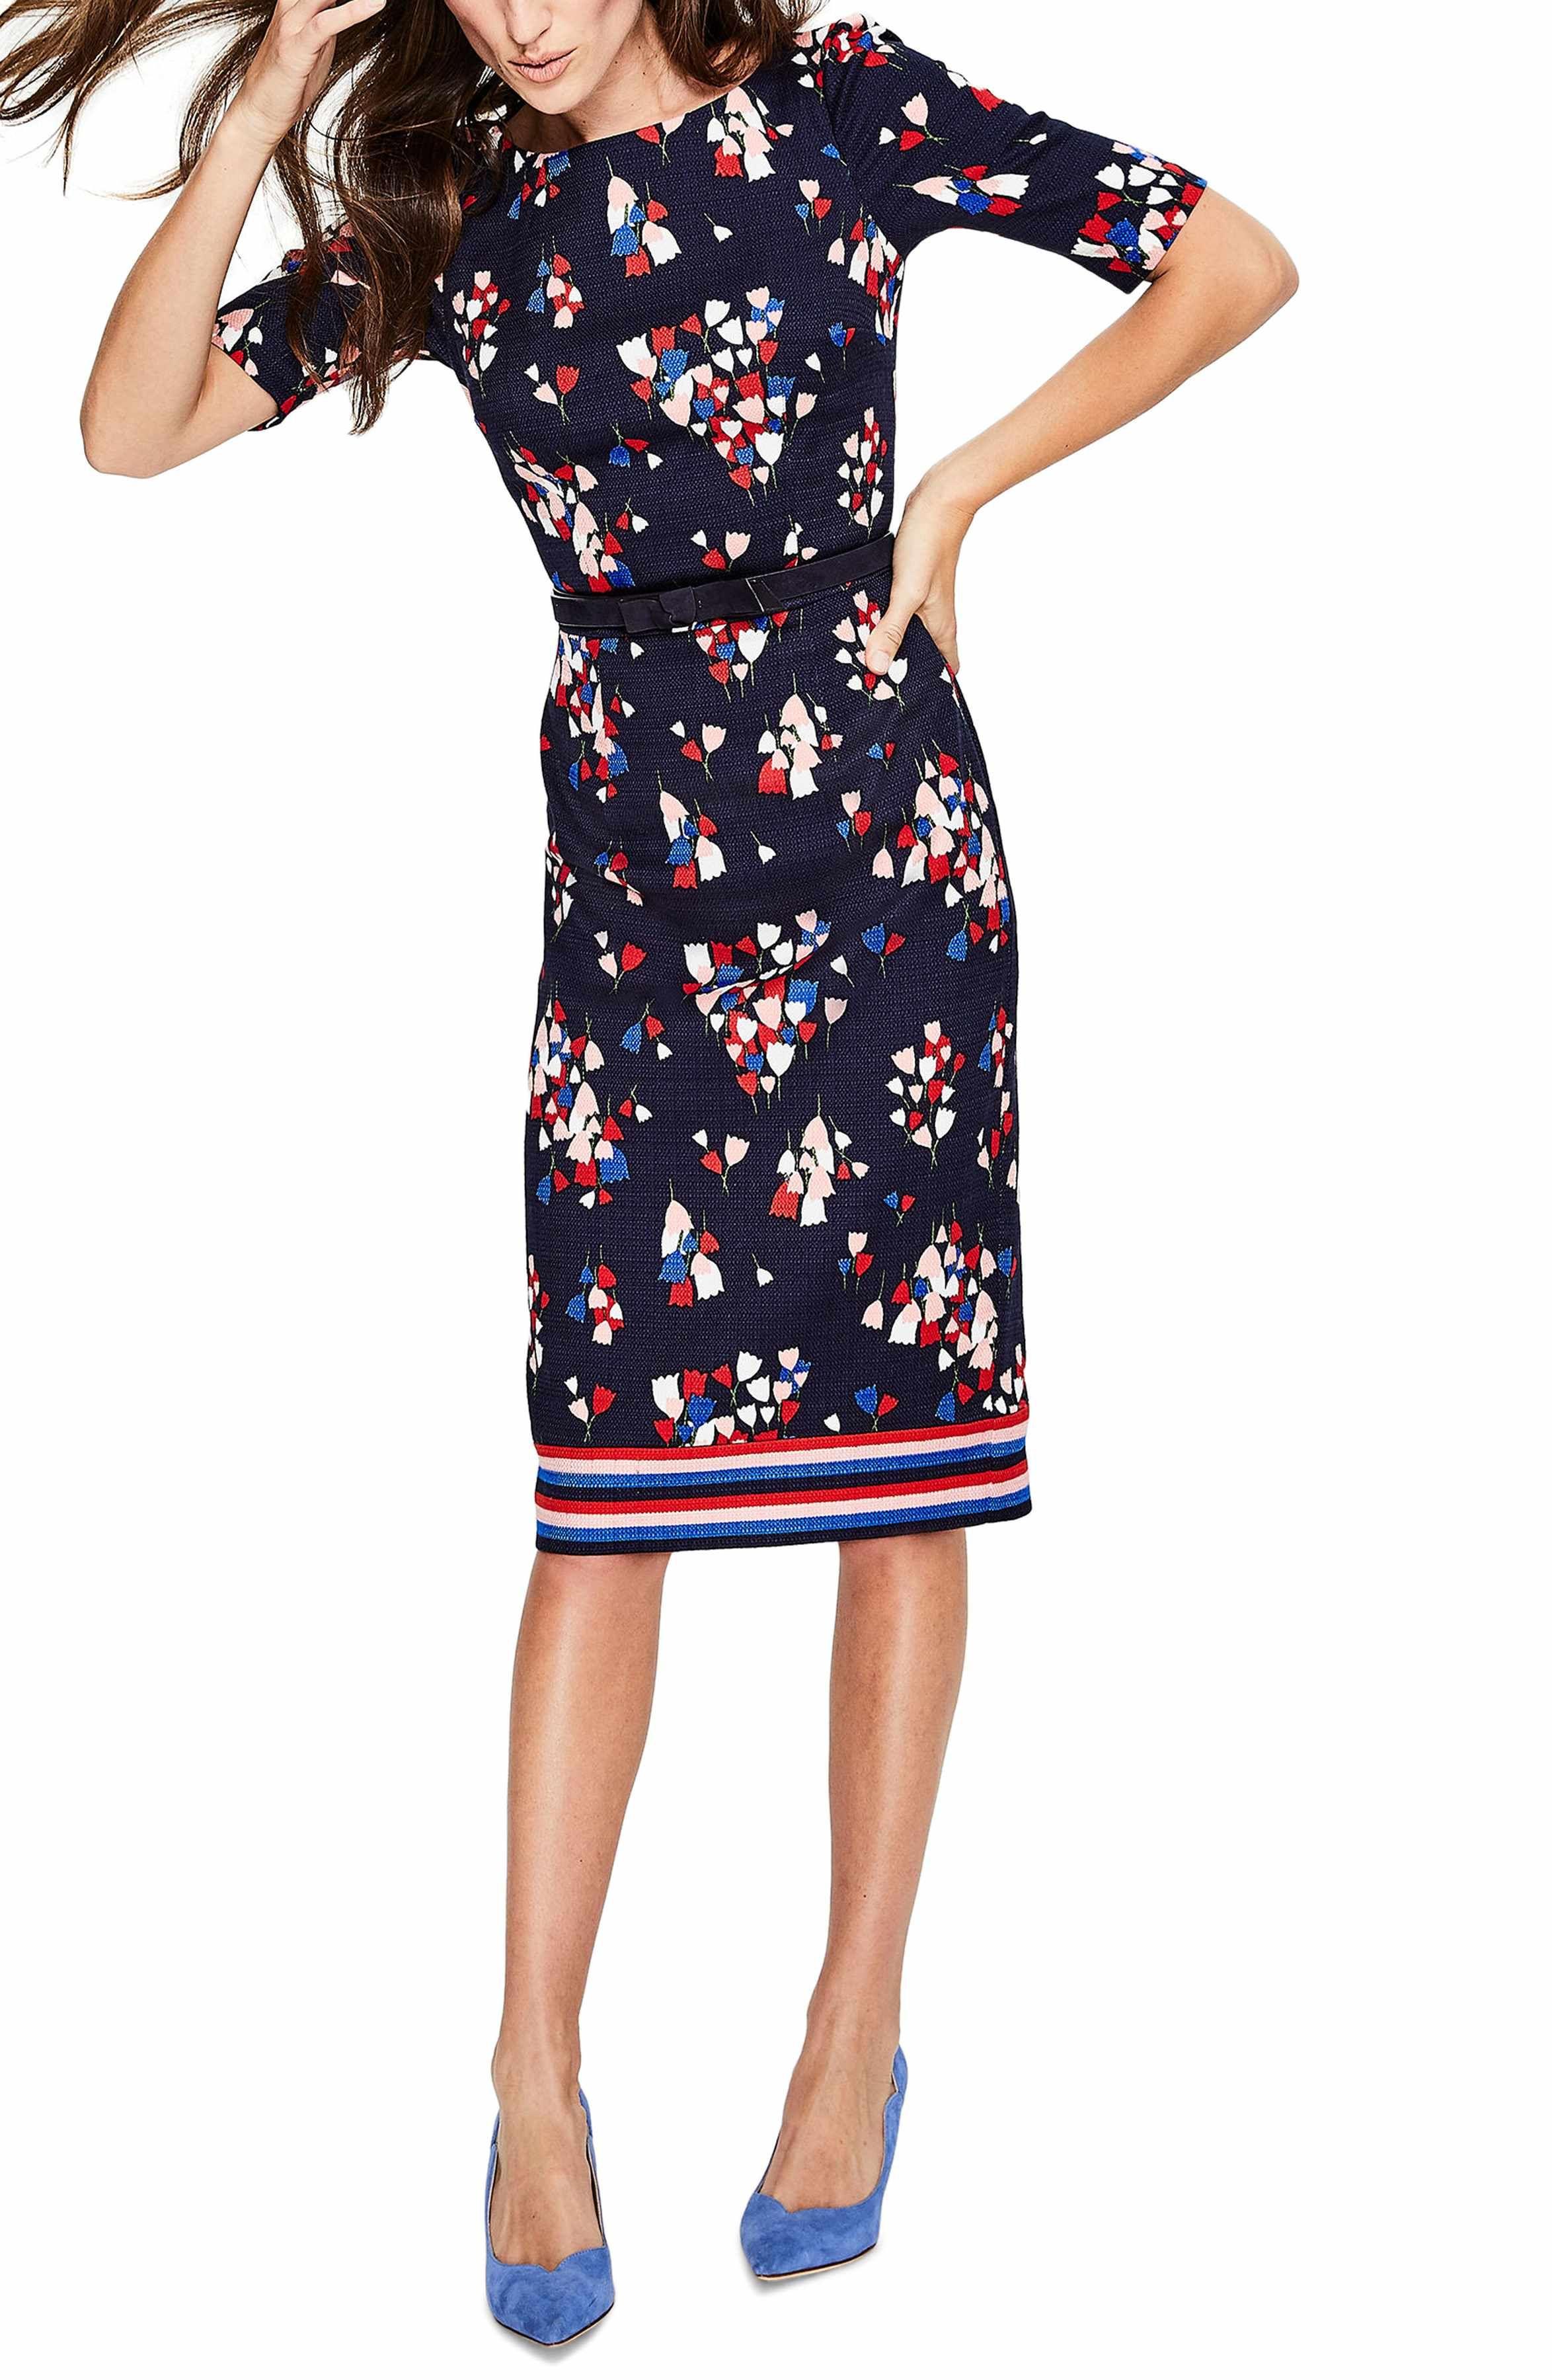 6fa74a7993f2 Main Image - Boden Fleur Sheath Dress Dresses For Work